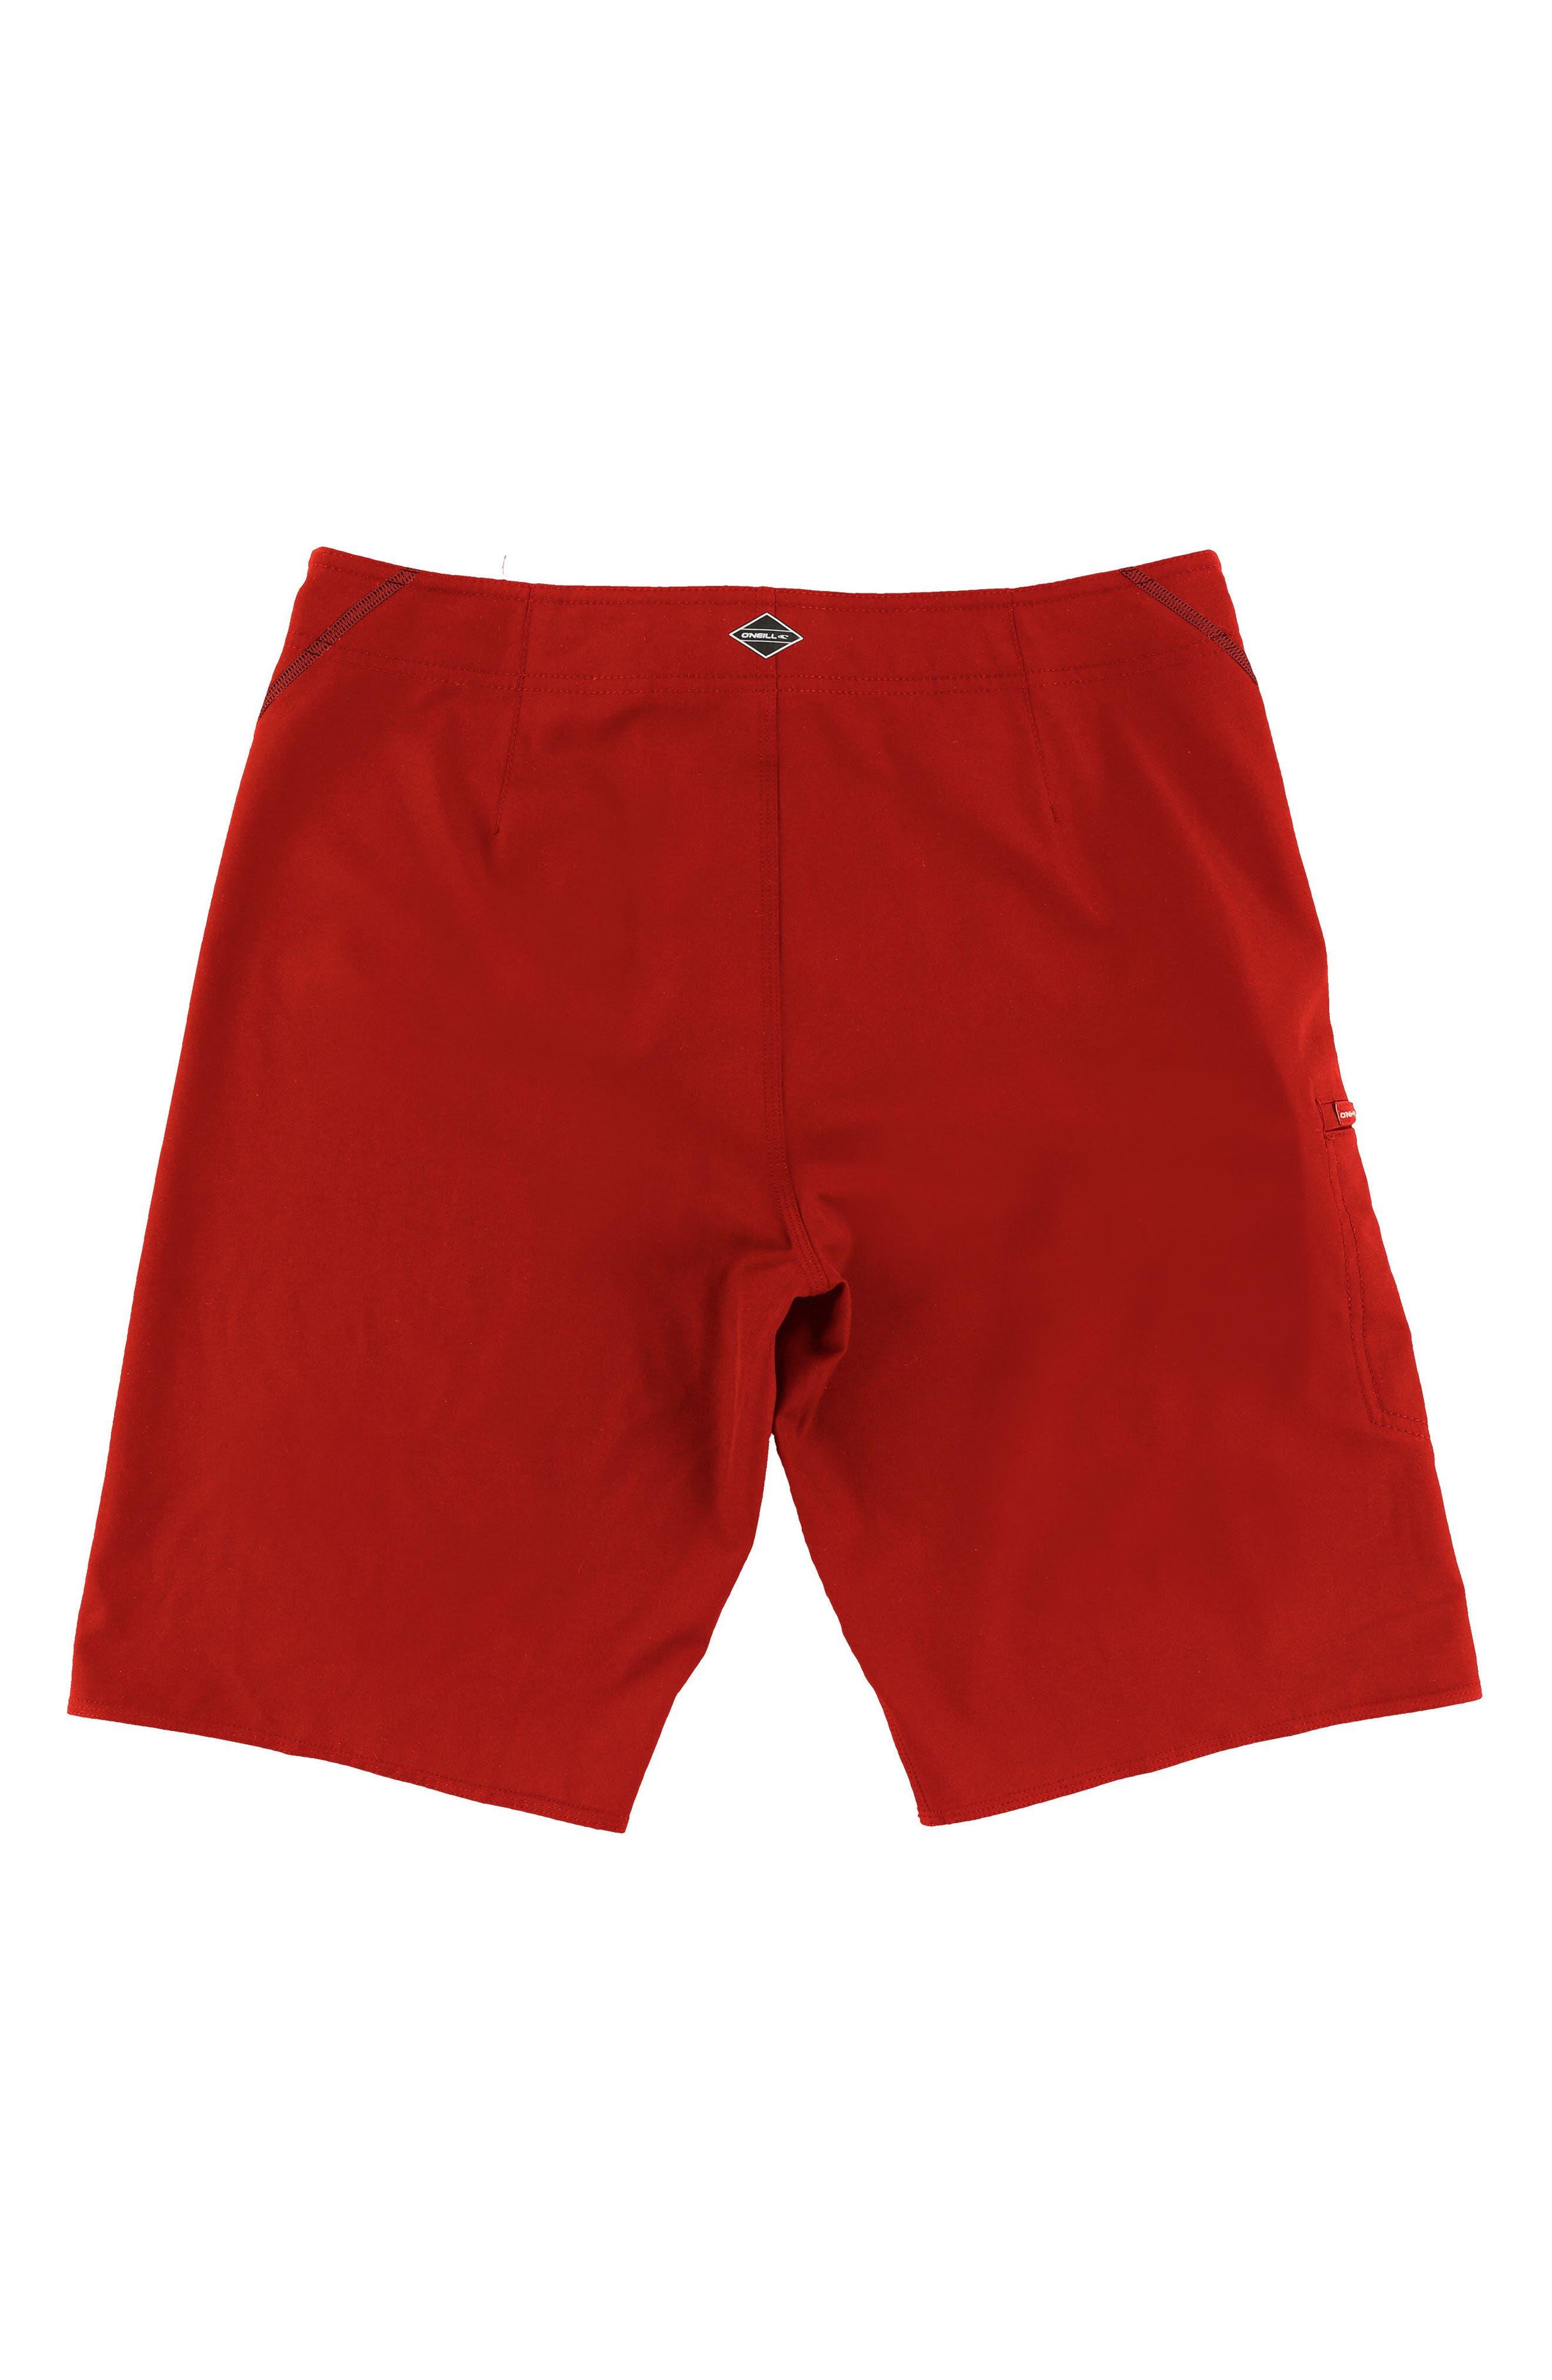 Hyperfreak S-Seam Stretch Board Shorts,                             Alternate thumbnail 7, color,